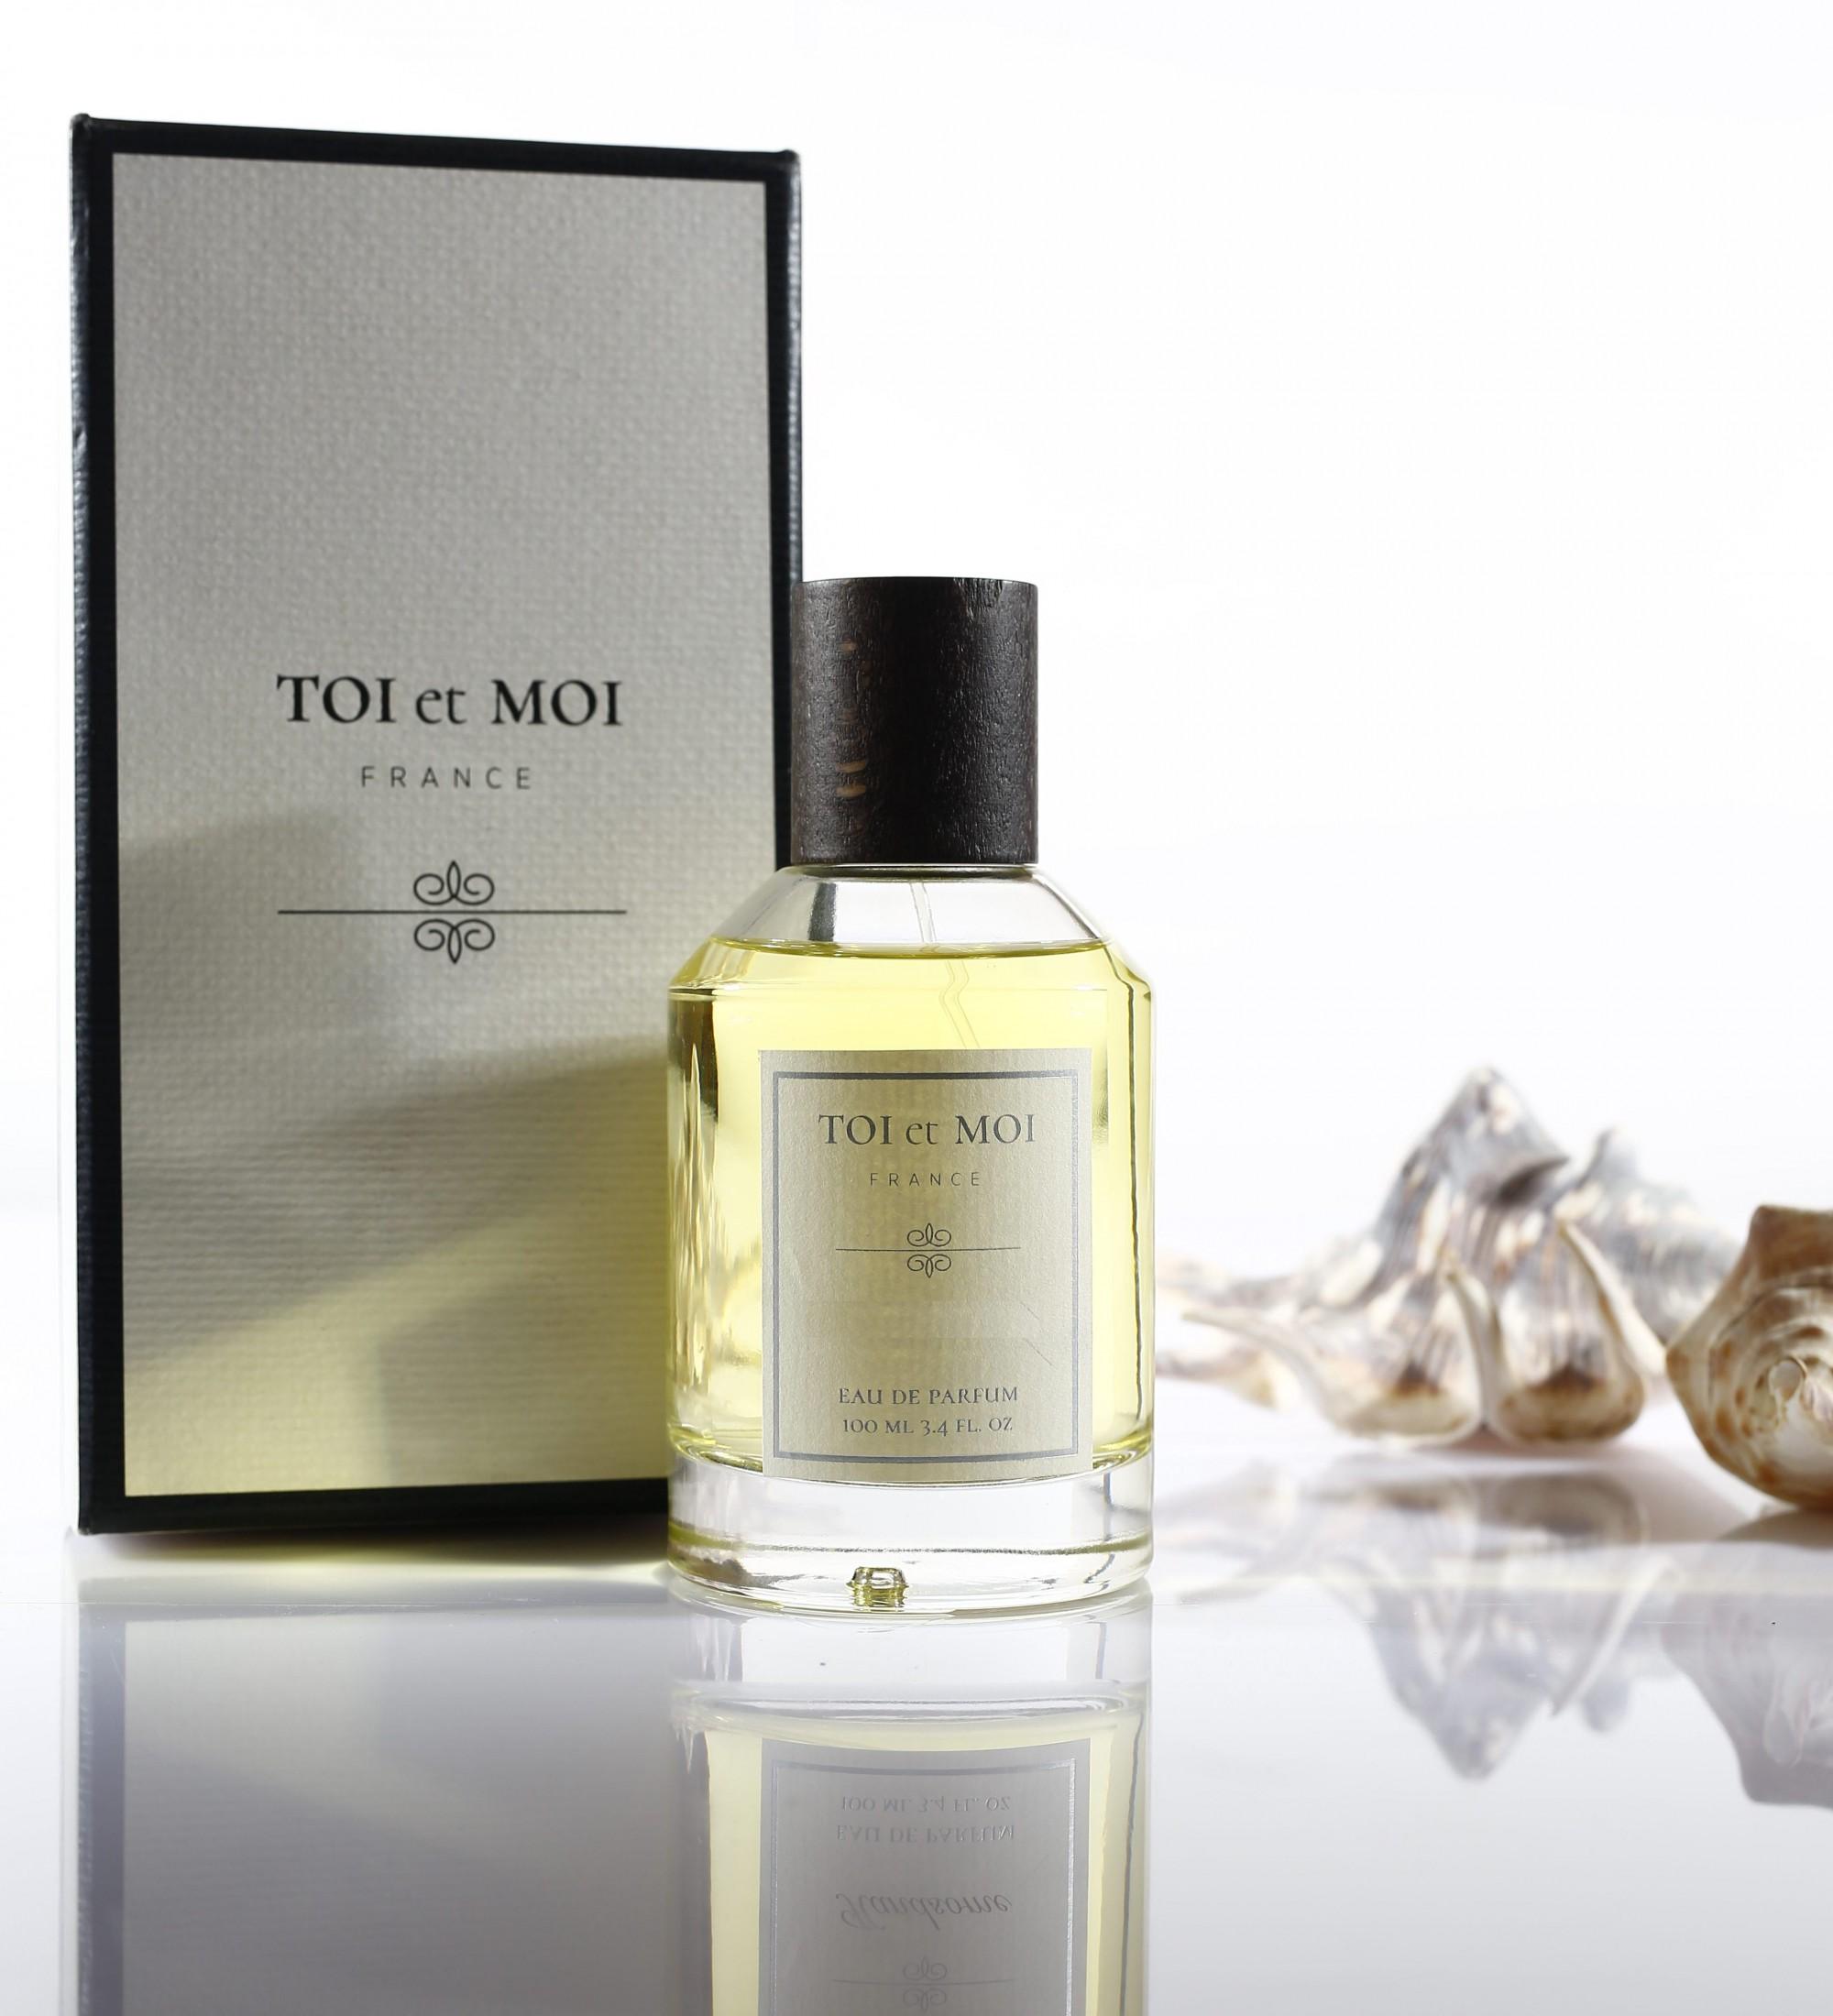 Toietmoi Uniq Eau De Parfume By Toietmoi Women Parfum For Women 100 ML 3.4 FL. OZ